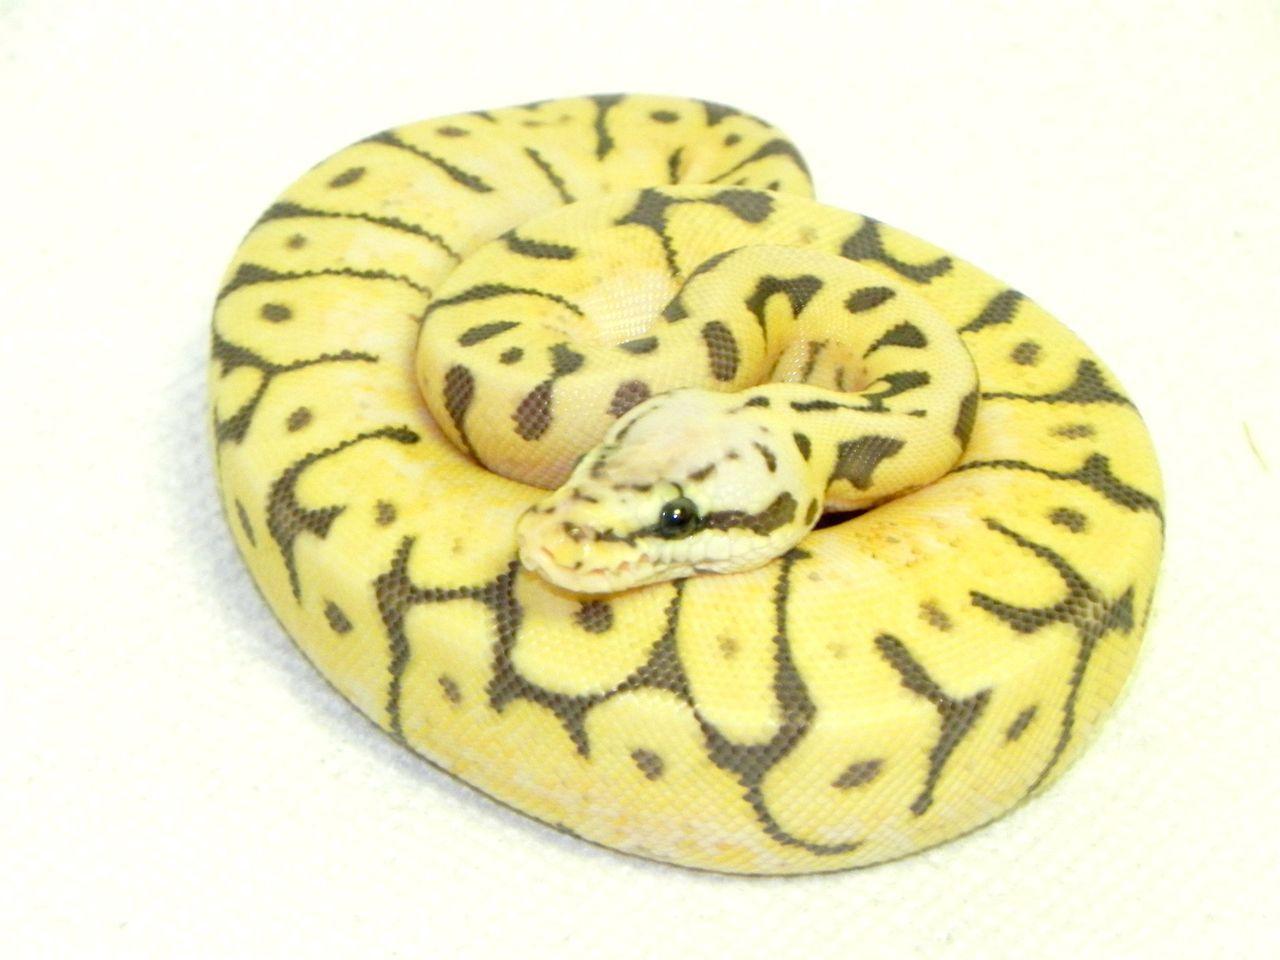 Bien connu Killer Bee Ball Pythons for sale (Python regius) KW37